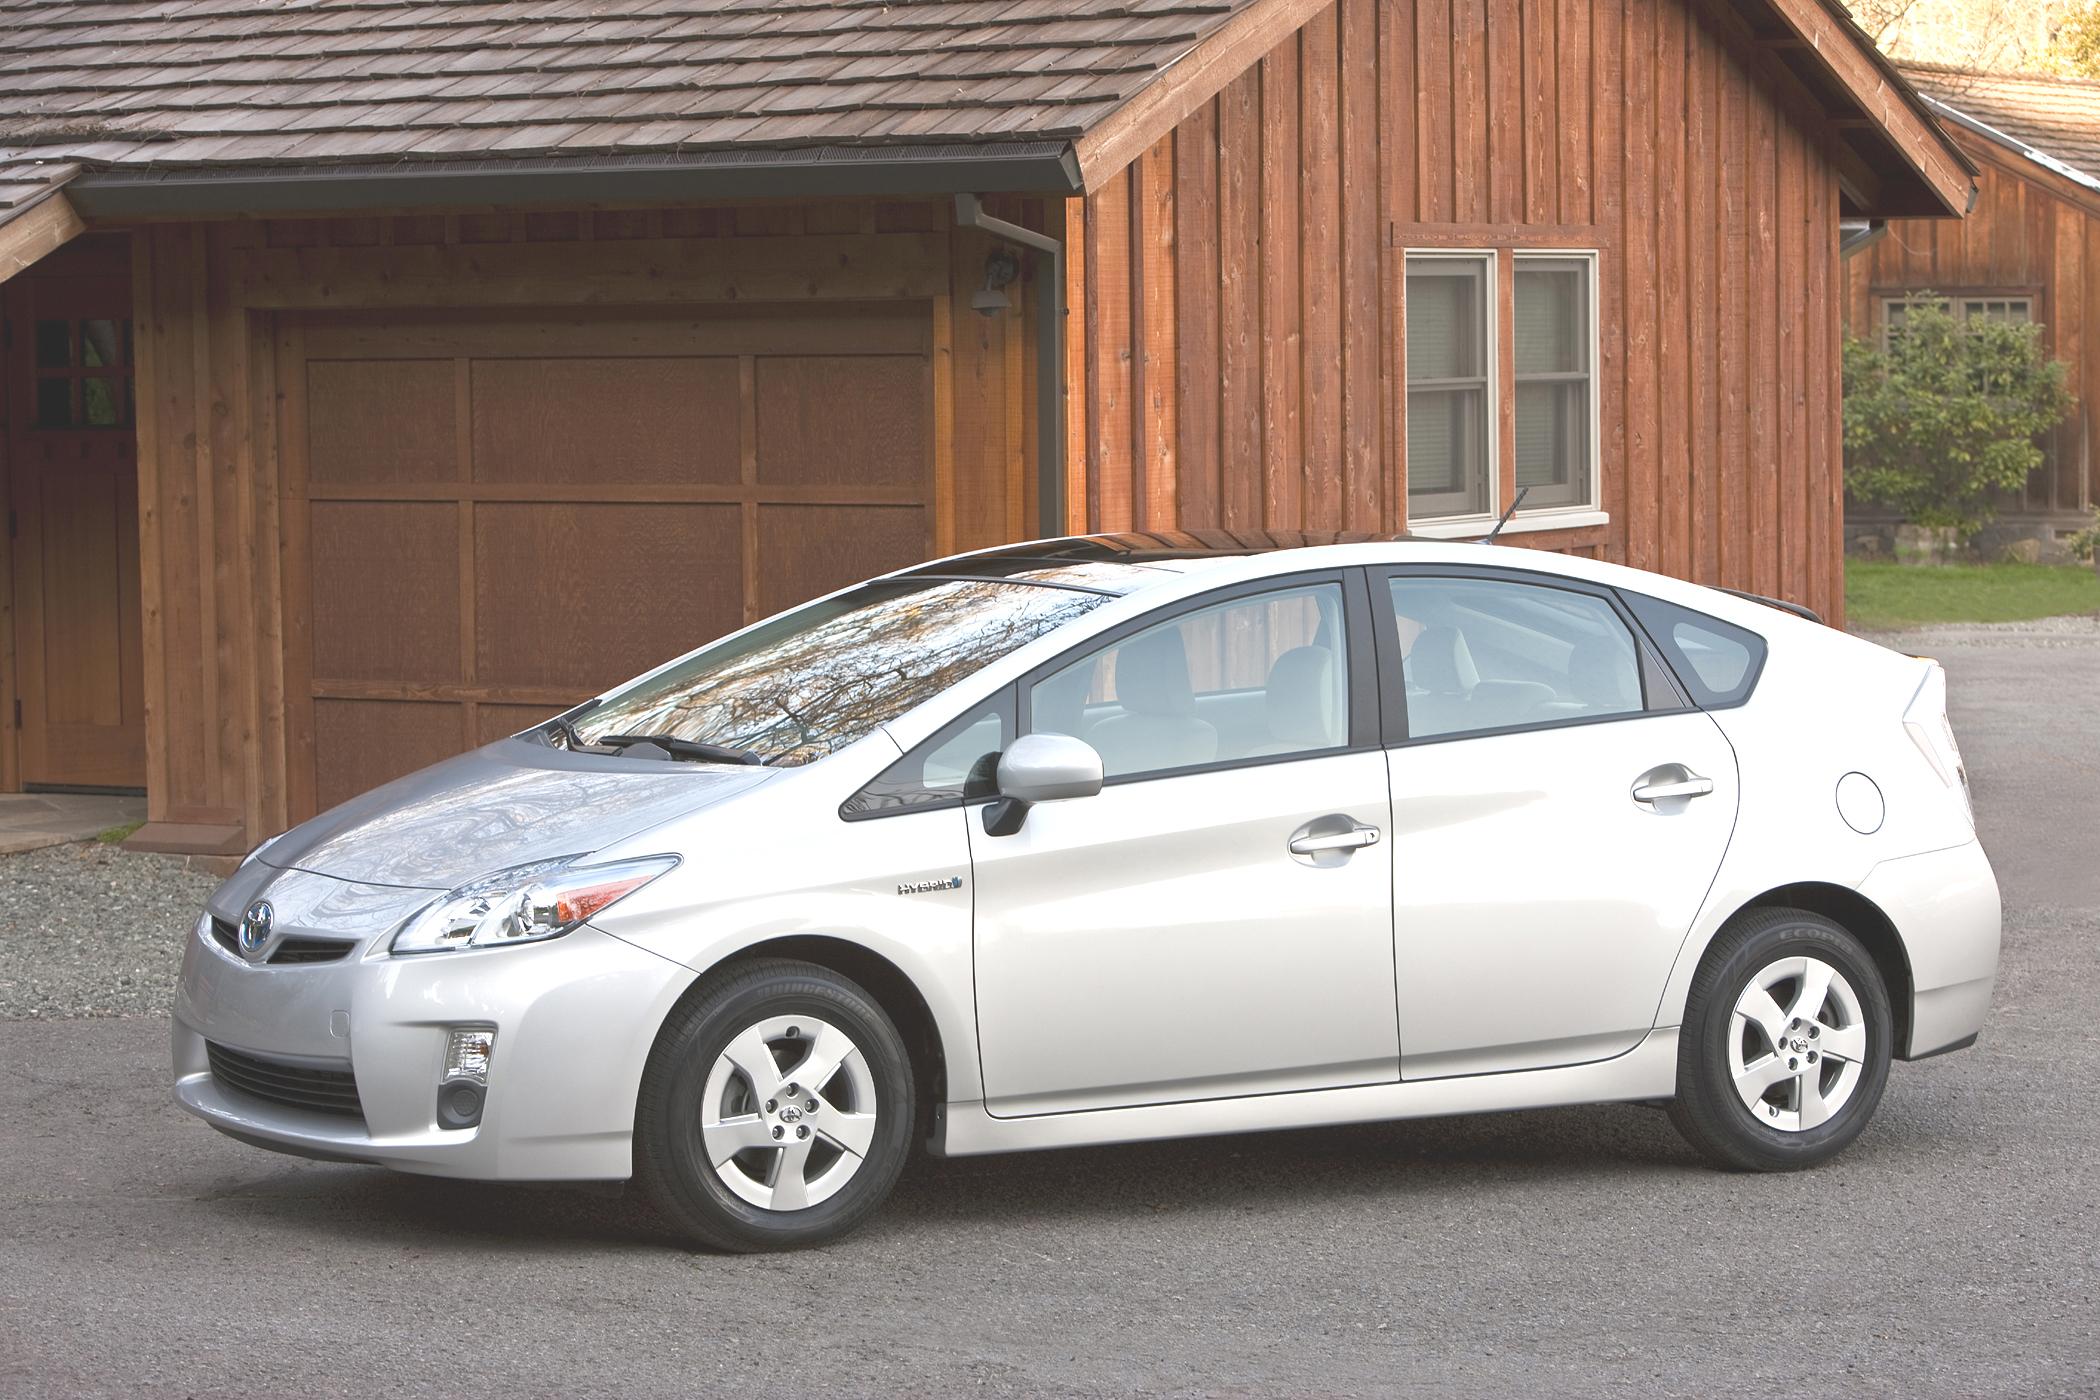 Hybrid smackdown: 2010 Honda Insight vs  2010 Toyota Prius